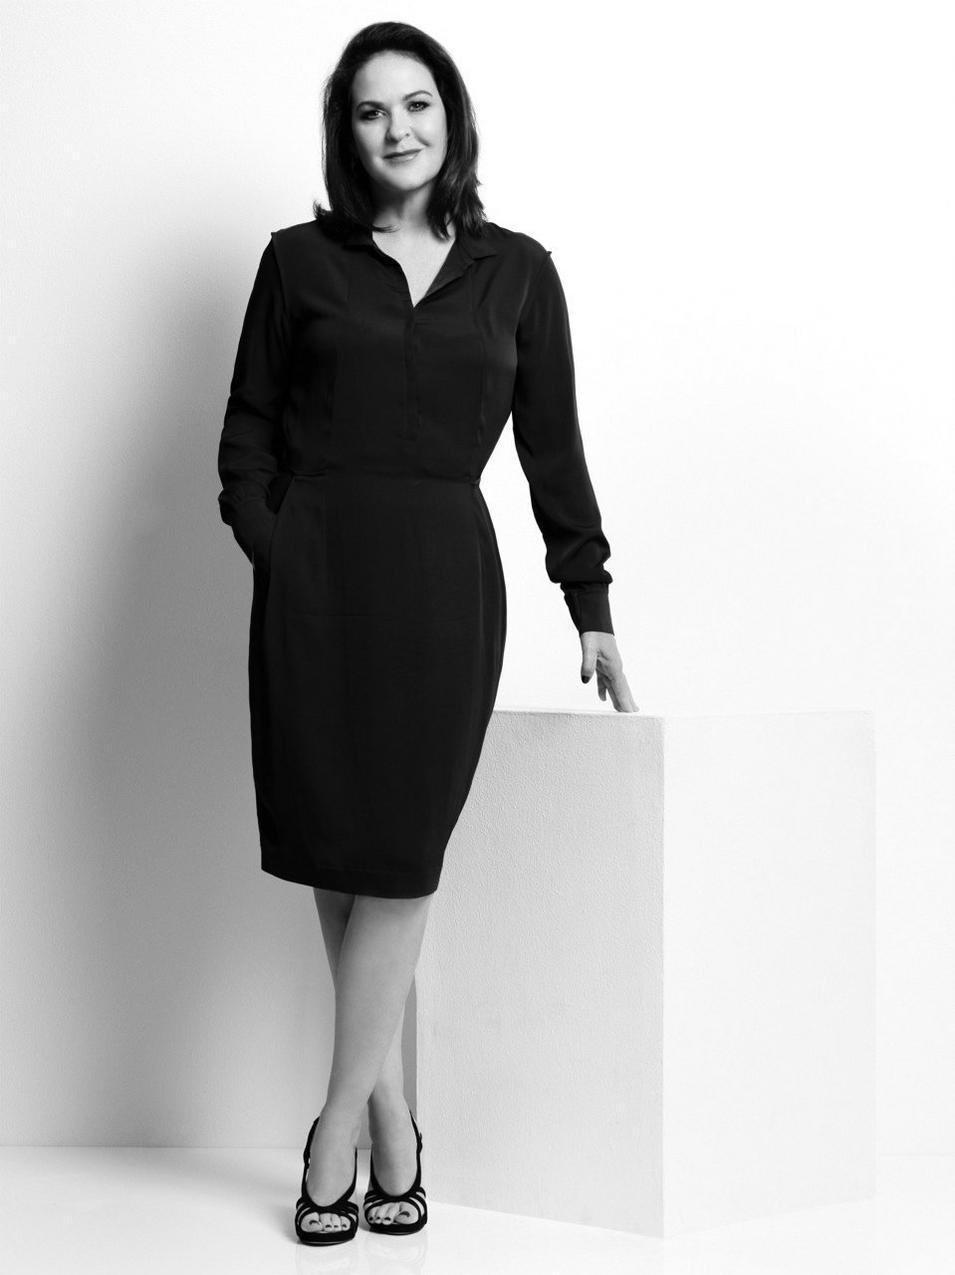 Kirstie Clements - fot. Max Doyle